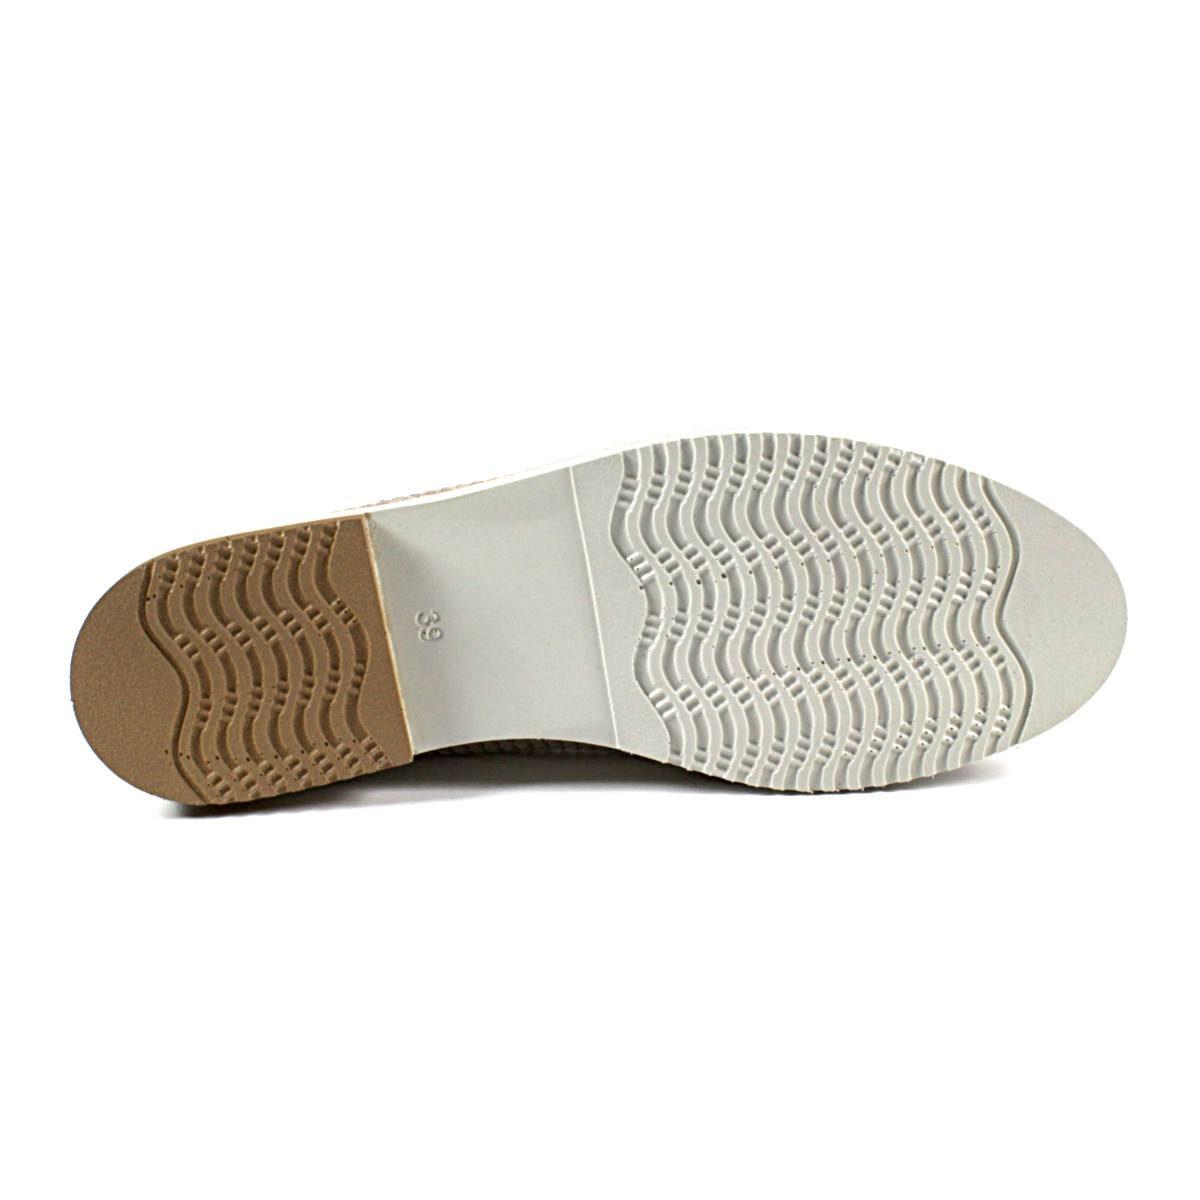 Златисти Дамски Обувки Естествена Кожа с Щампа Ходило